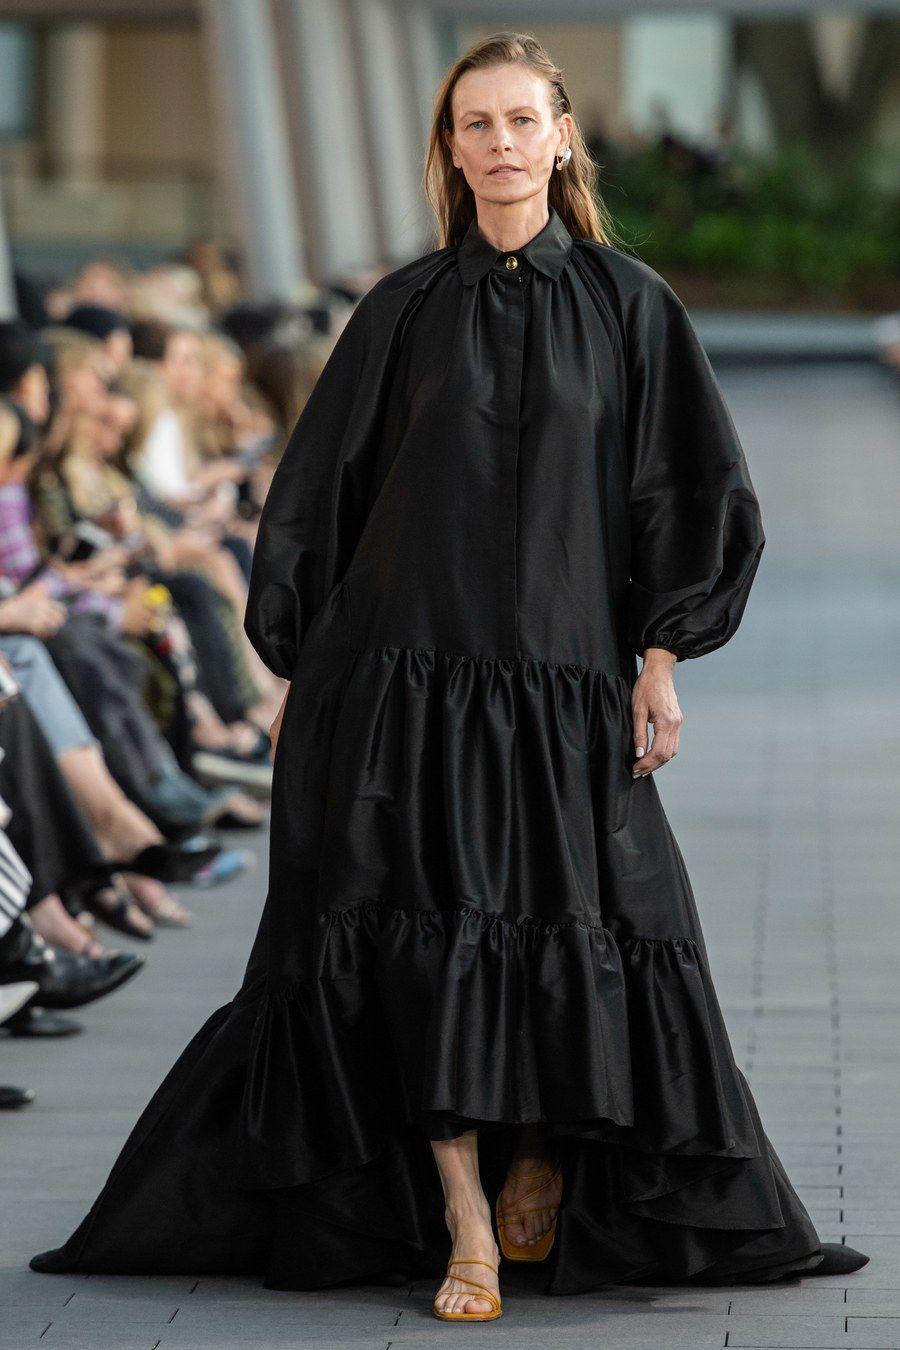 Black Fashion Designers 2020.Aje Australia Resort 2020 Collection Vogue The Good Life